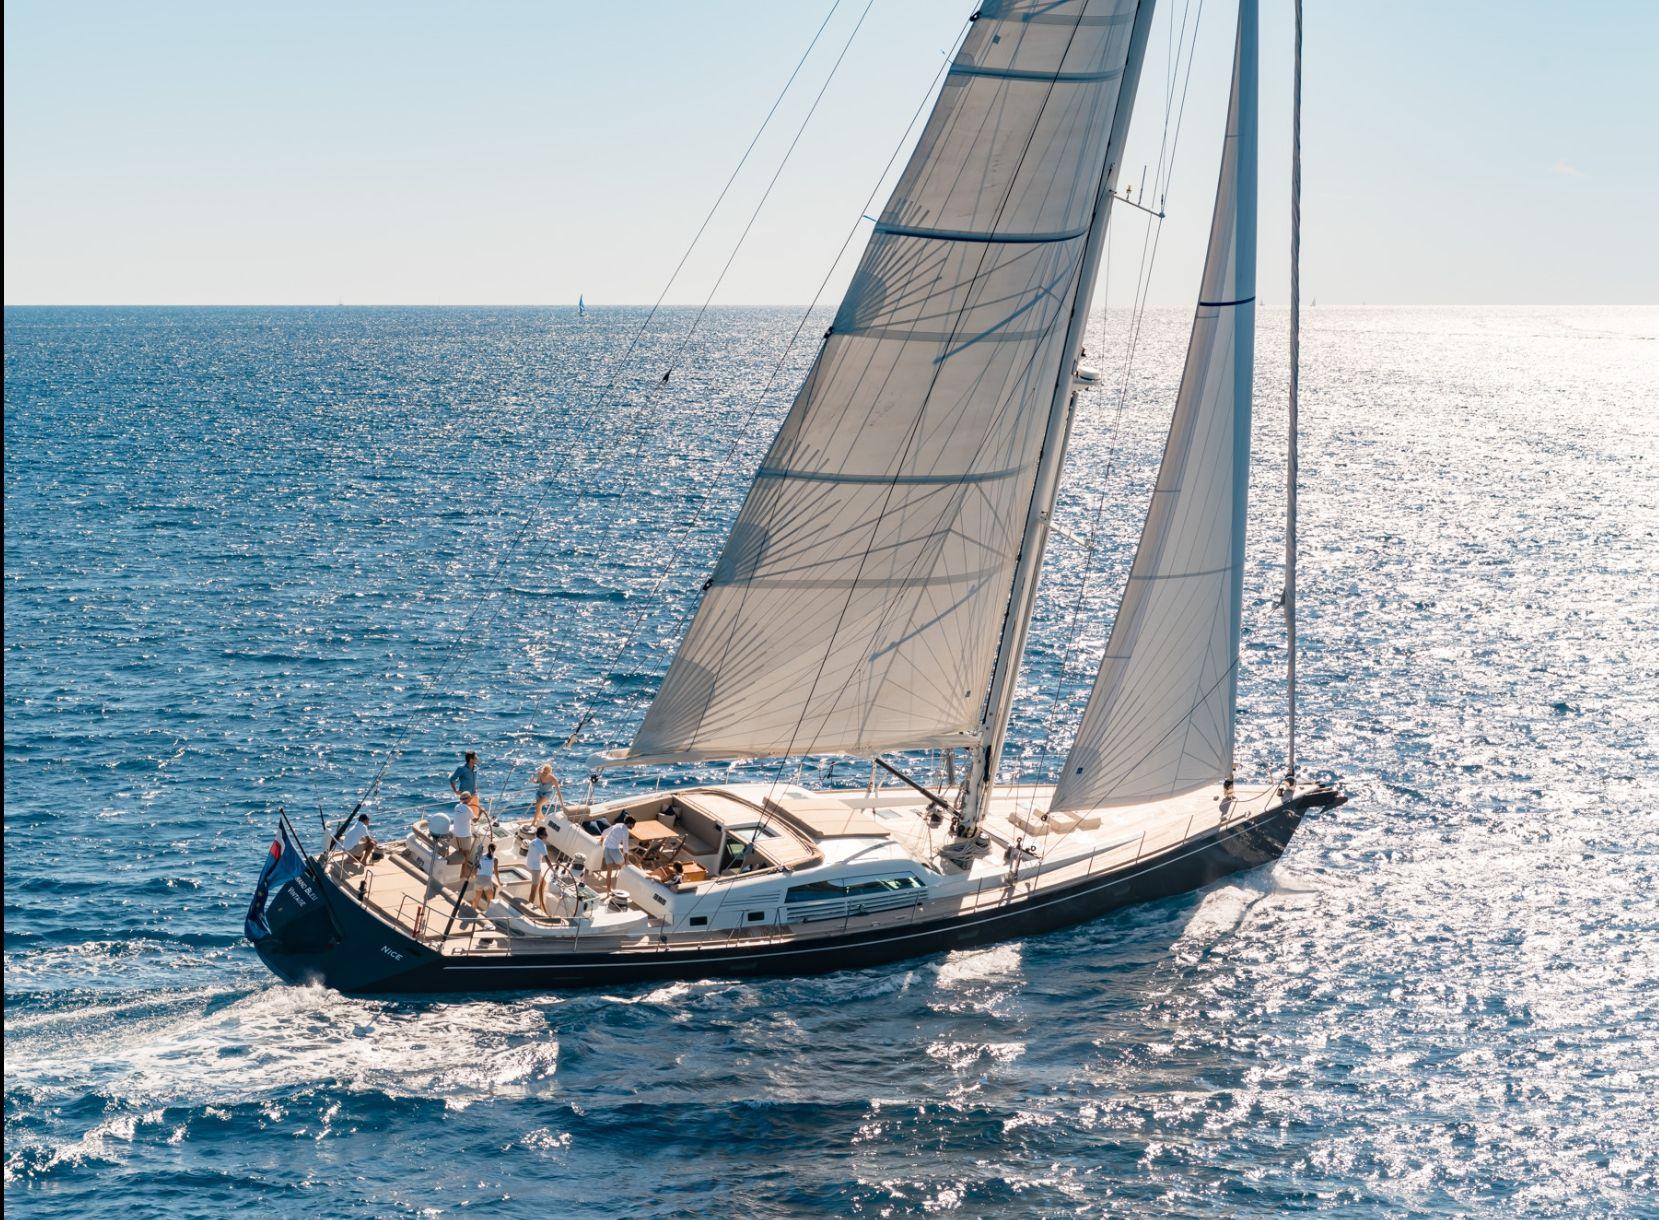 GRAND BLEU VINTAGE - CNB 95 - 4 Cabins - Palma - Ibiza - Monaco - Porto Cervo